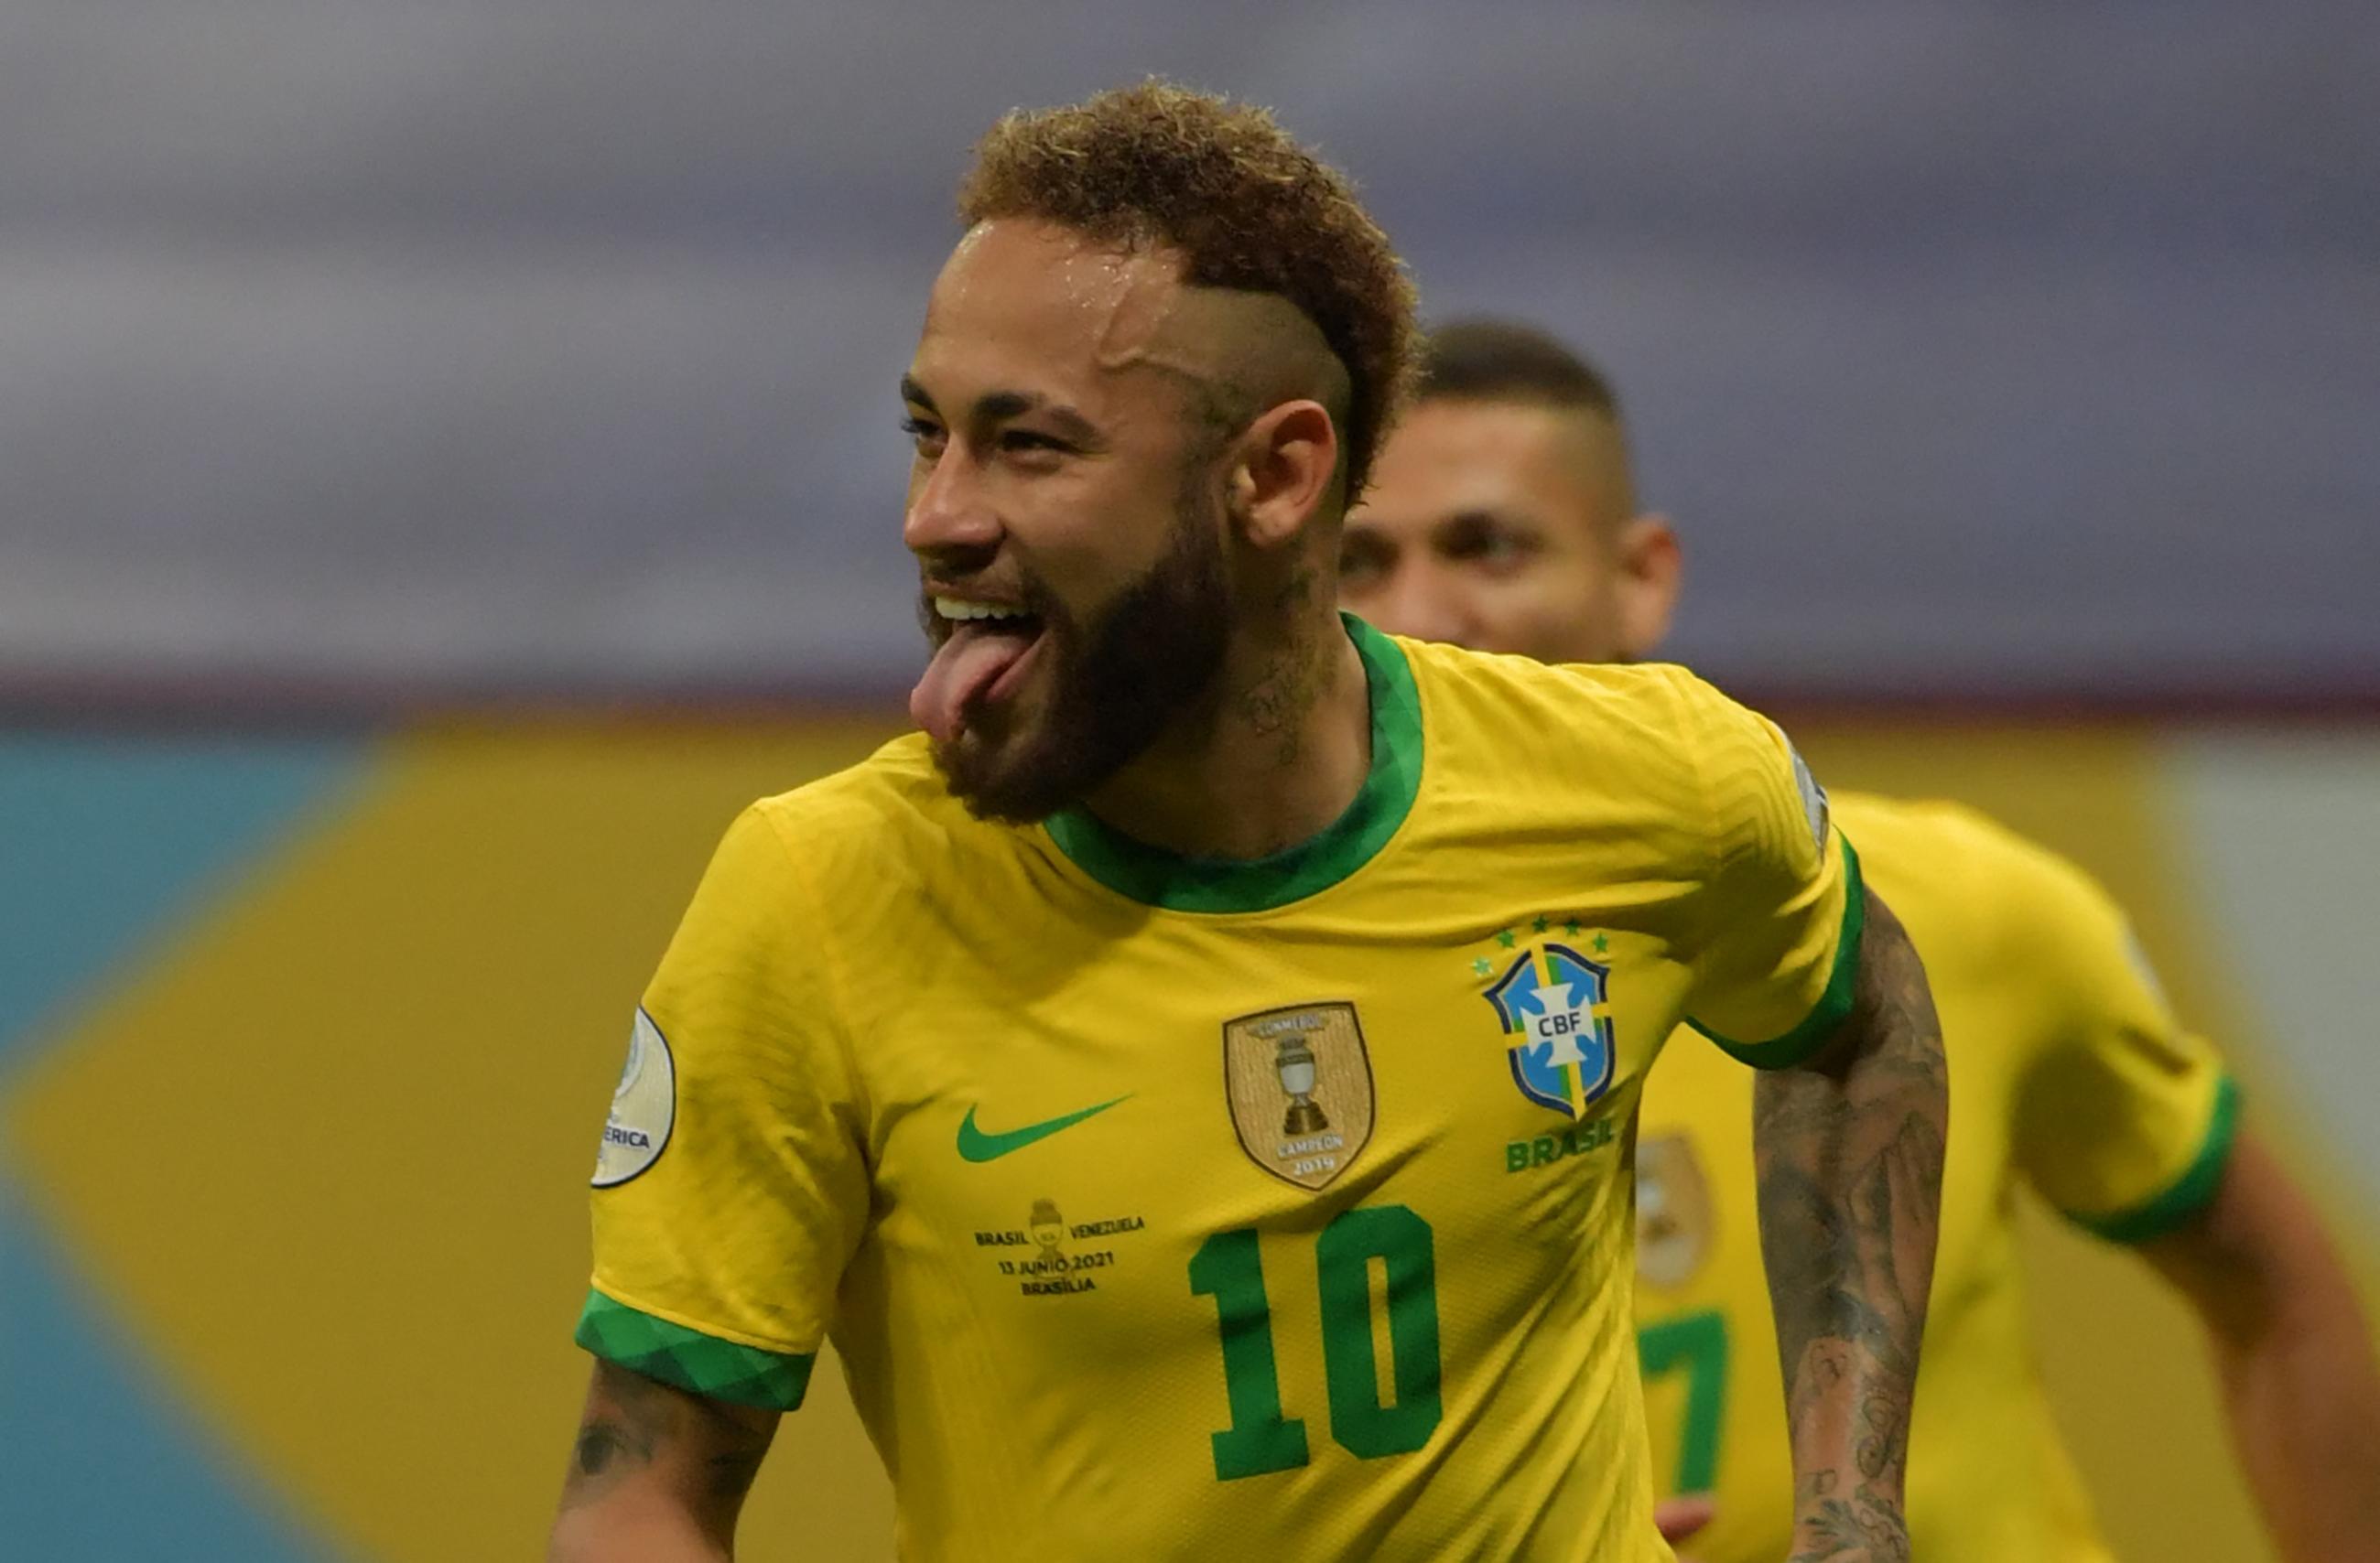 Neymar closing in on Sunil Chhetri, Pele after Venezuela goal